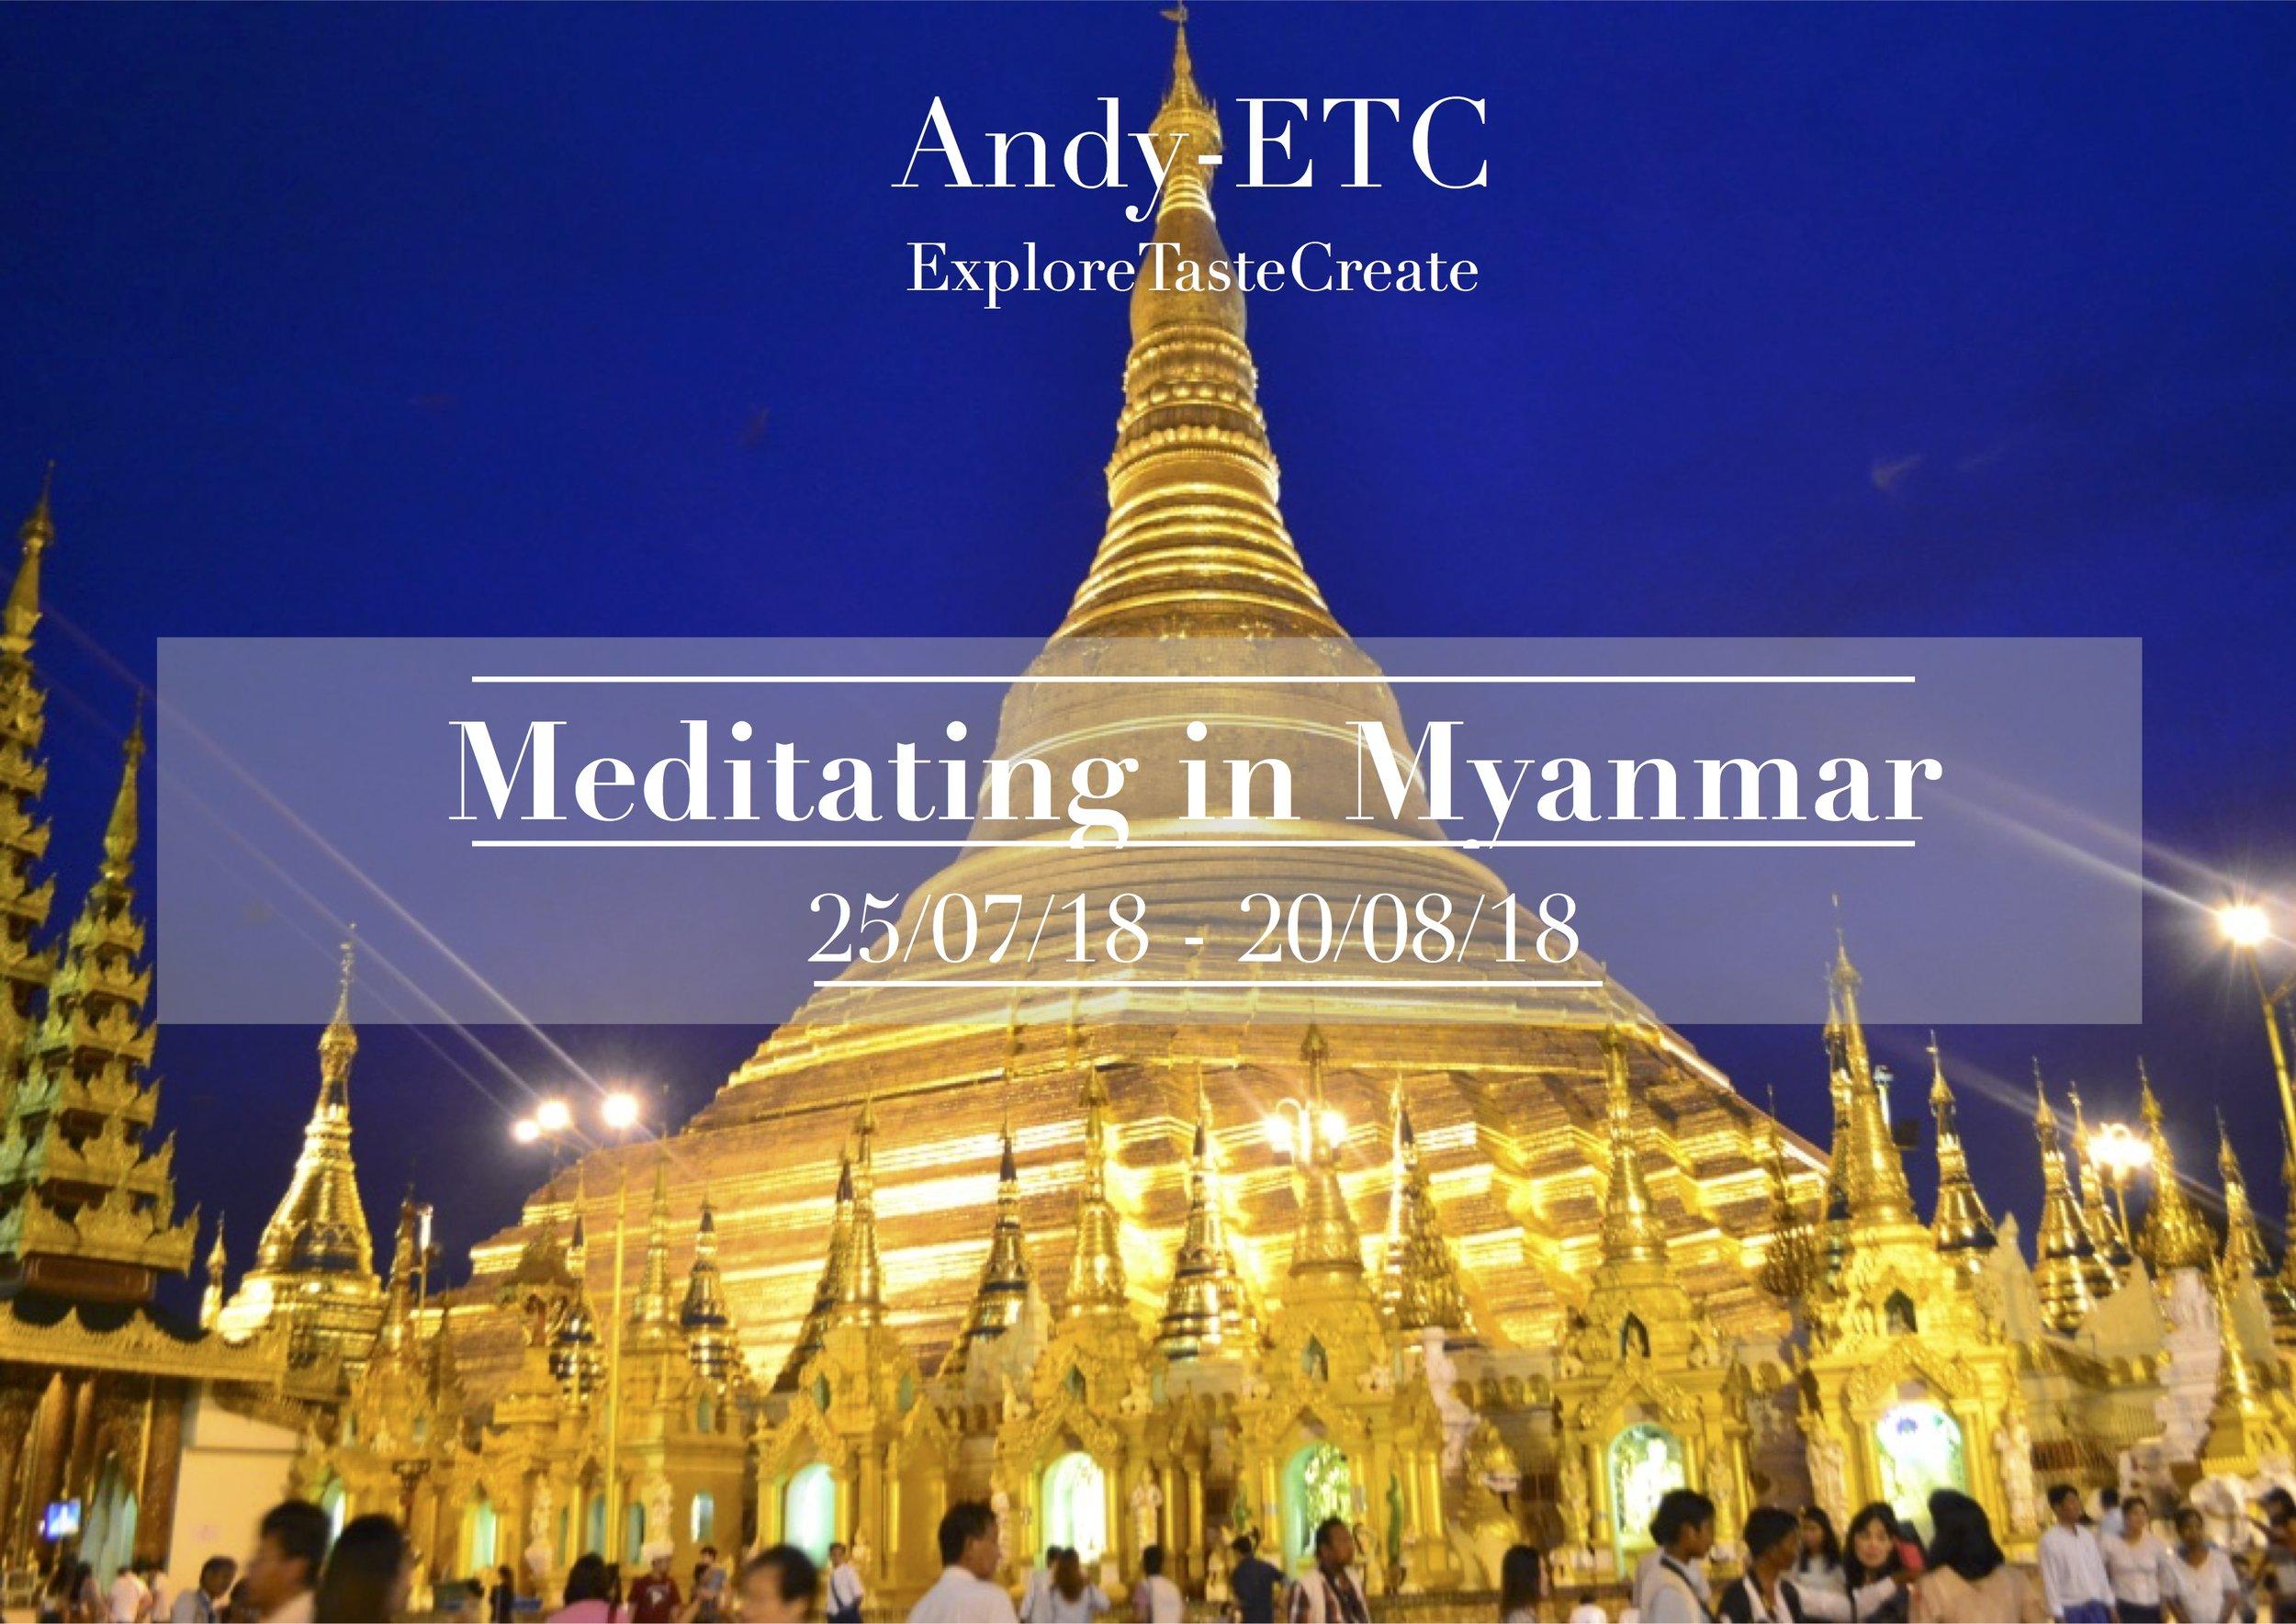 Meditating in Mynamar Image.jpg